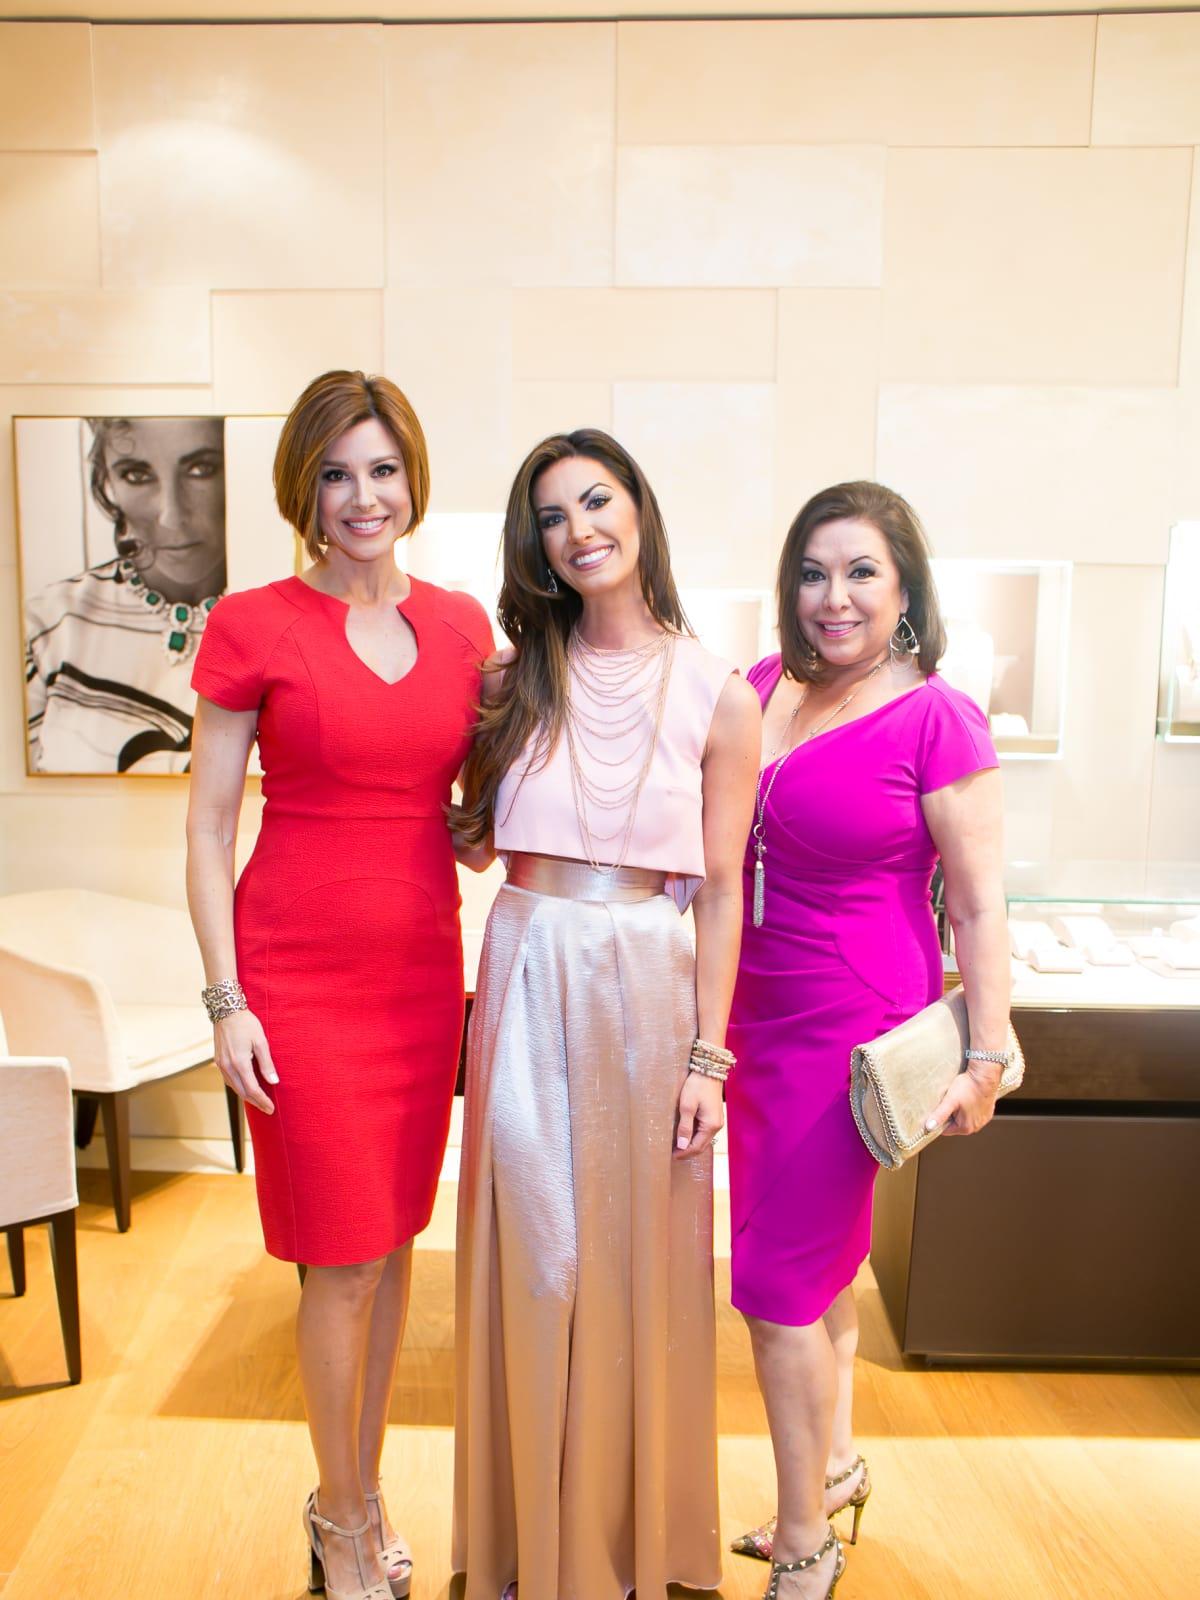 International Mothers' Day at Bulgari, March 2016, Dominique Sachse, Nicole O'Brien Lassiter, Debbie Festari